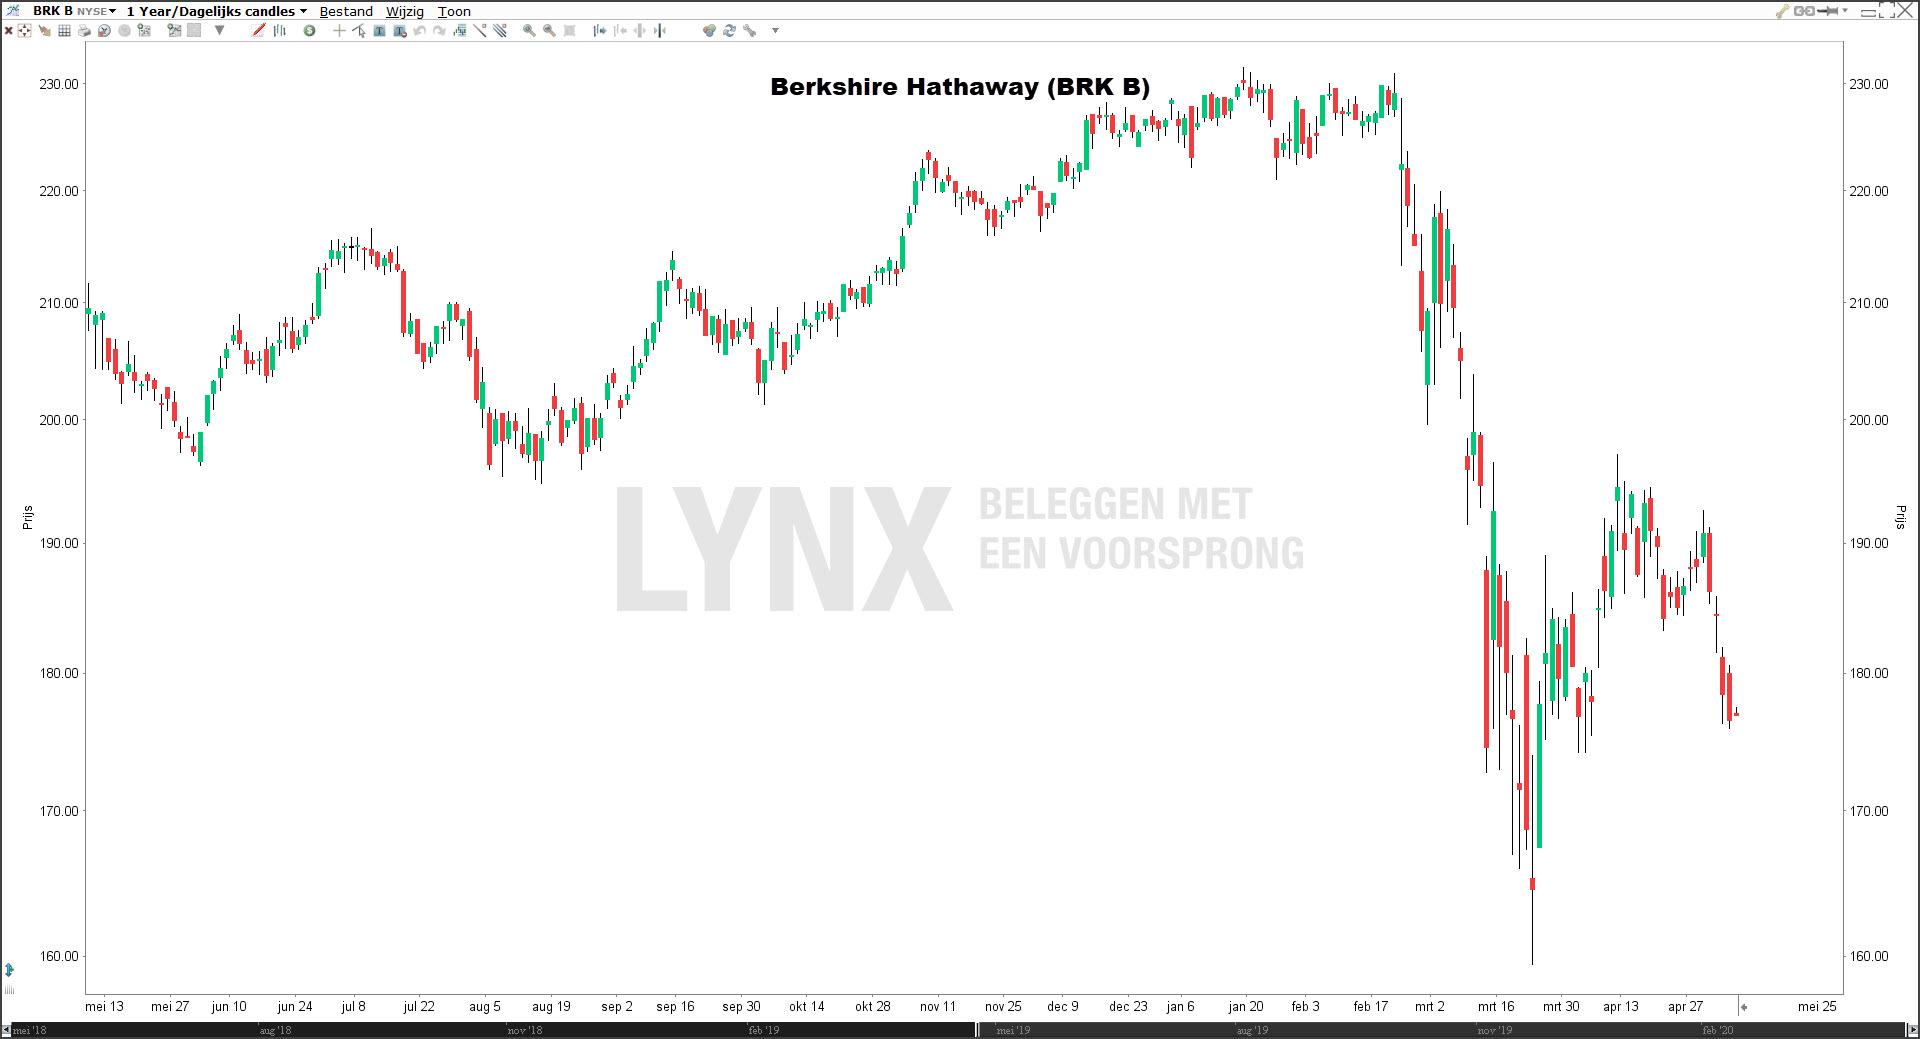 Koers Berkshire Hathaway aandeel